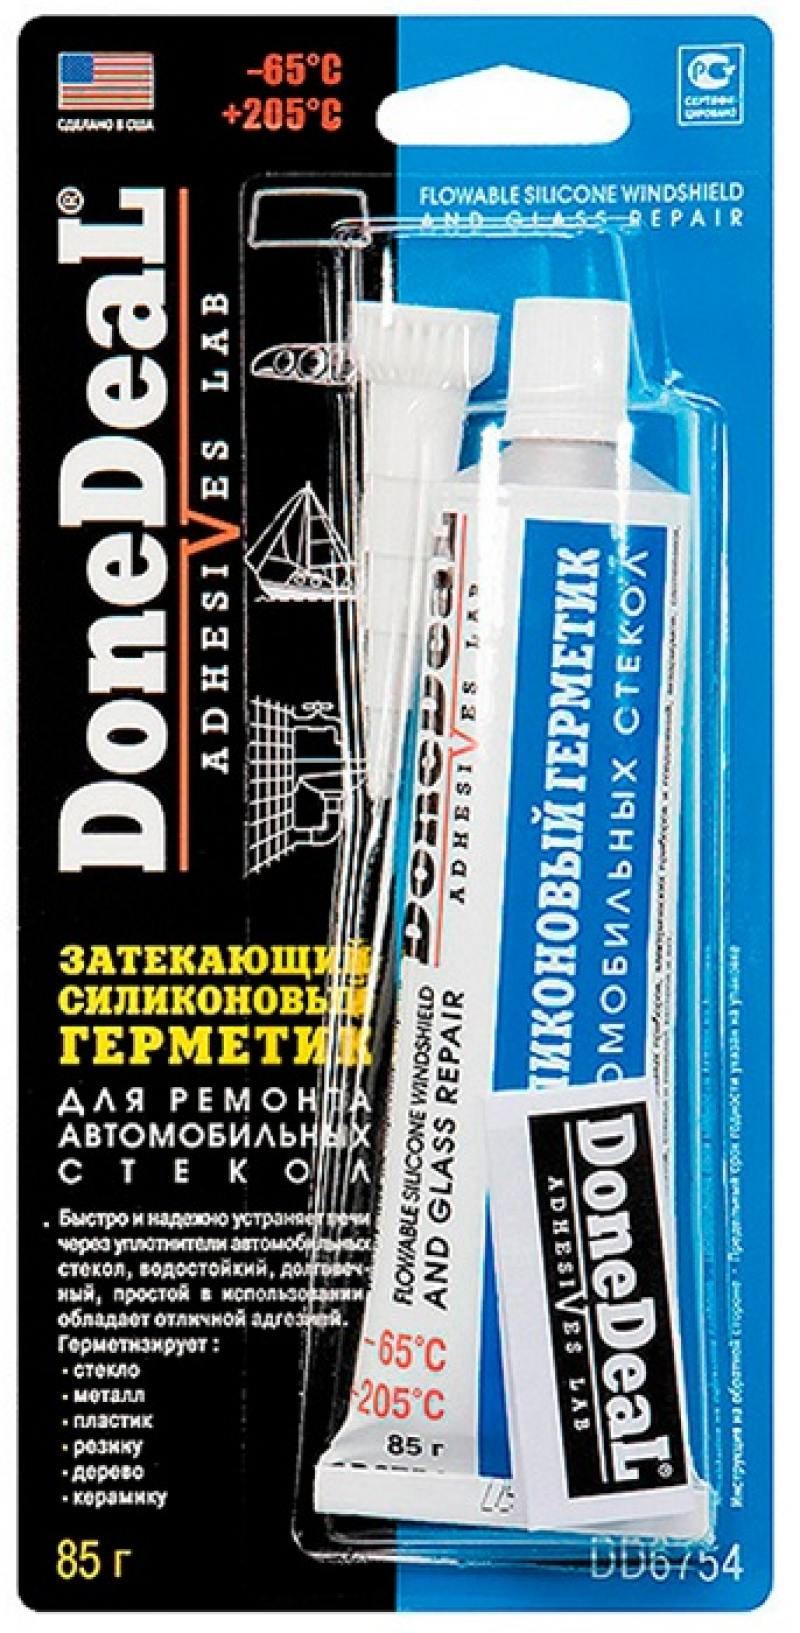 Герметик для ремонта стекол Done Deal DD 6754 done deal dd 6698